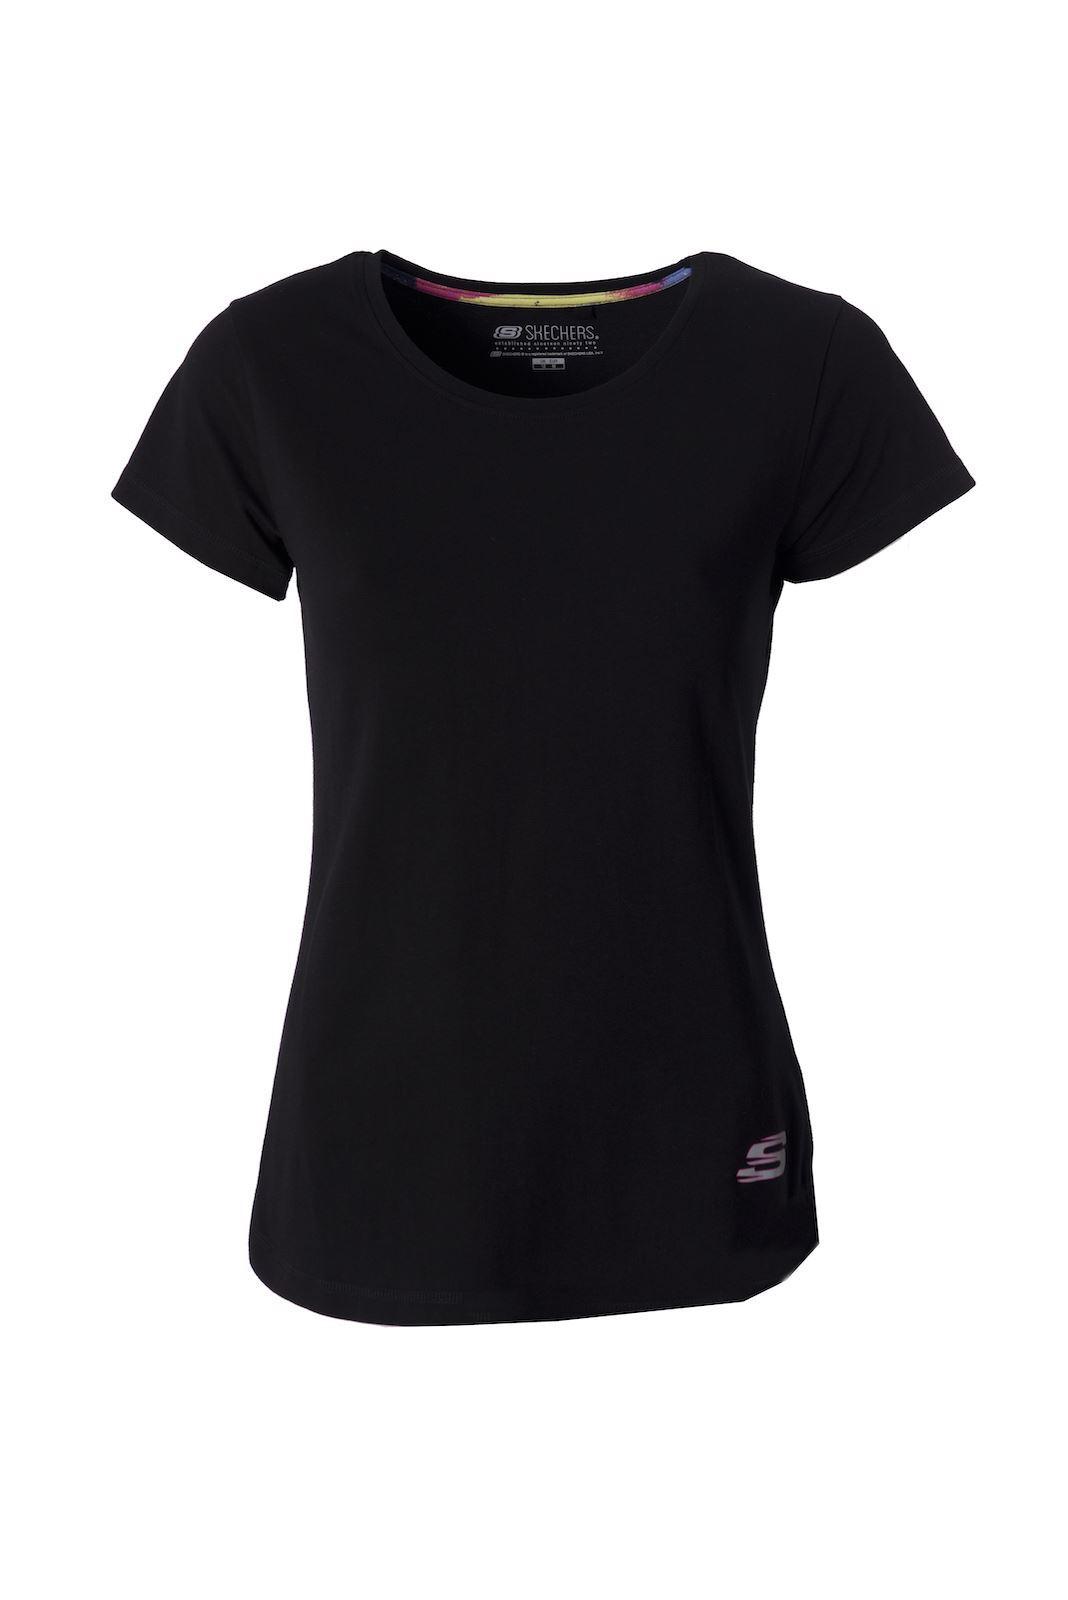 58fb5b23d2b skechers t shirt womens black sale   OFF62% Discounted